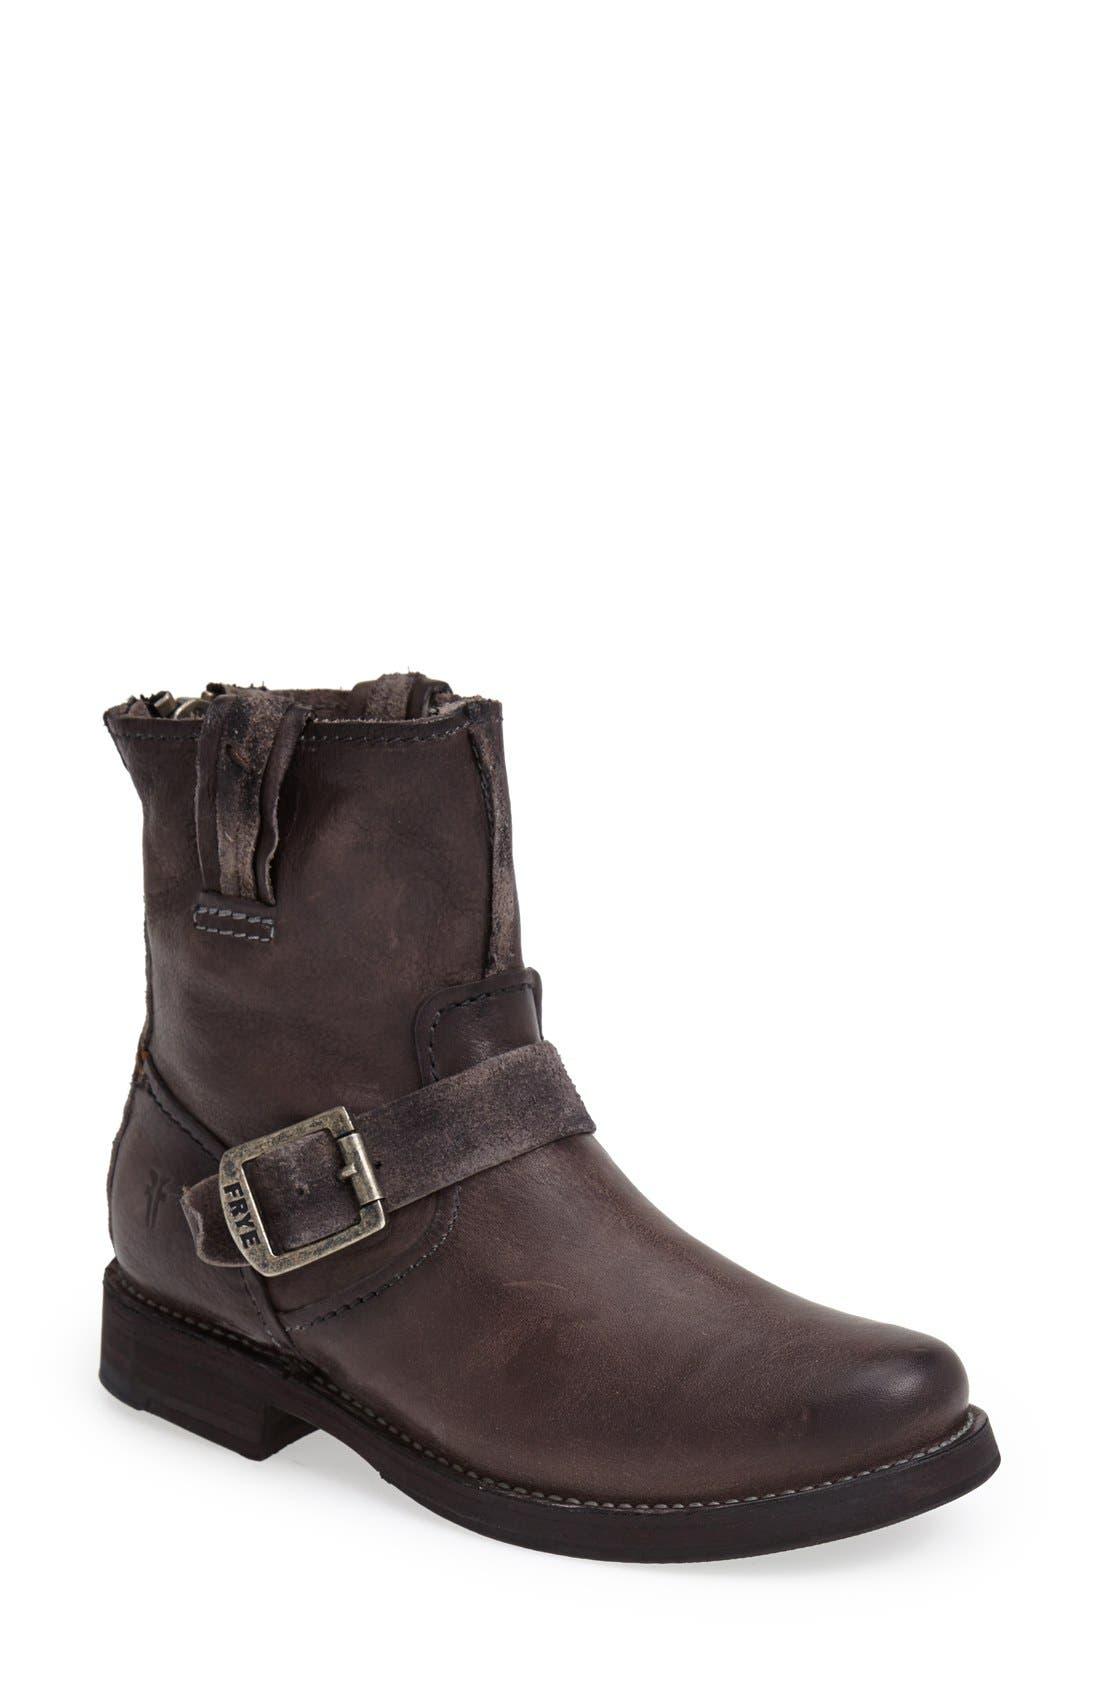 Main Image - Frye 'Vicky Artisan' Back Zip Boot (Women)